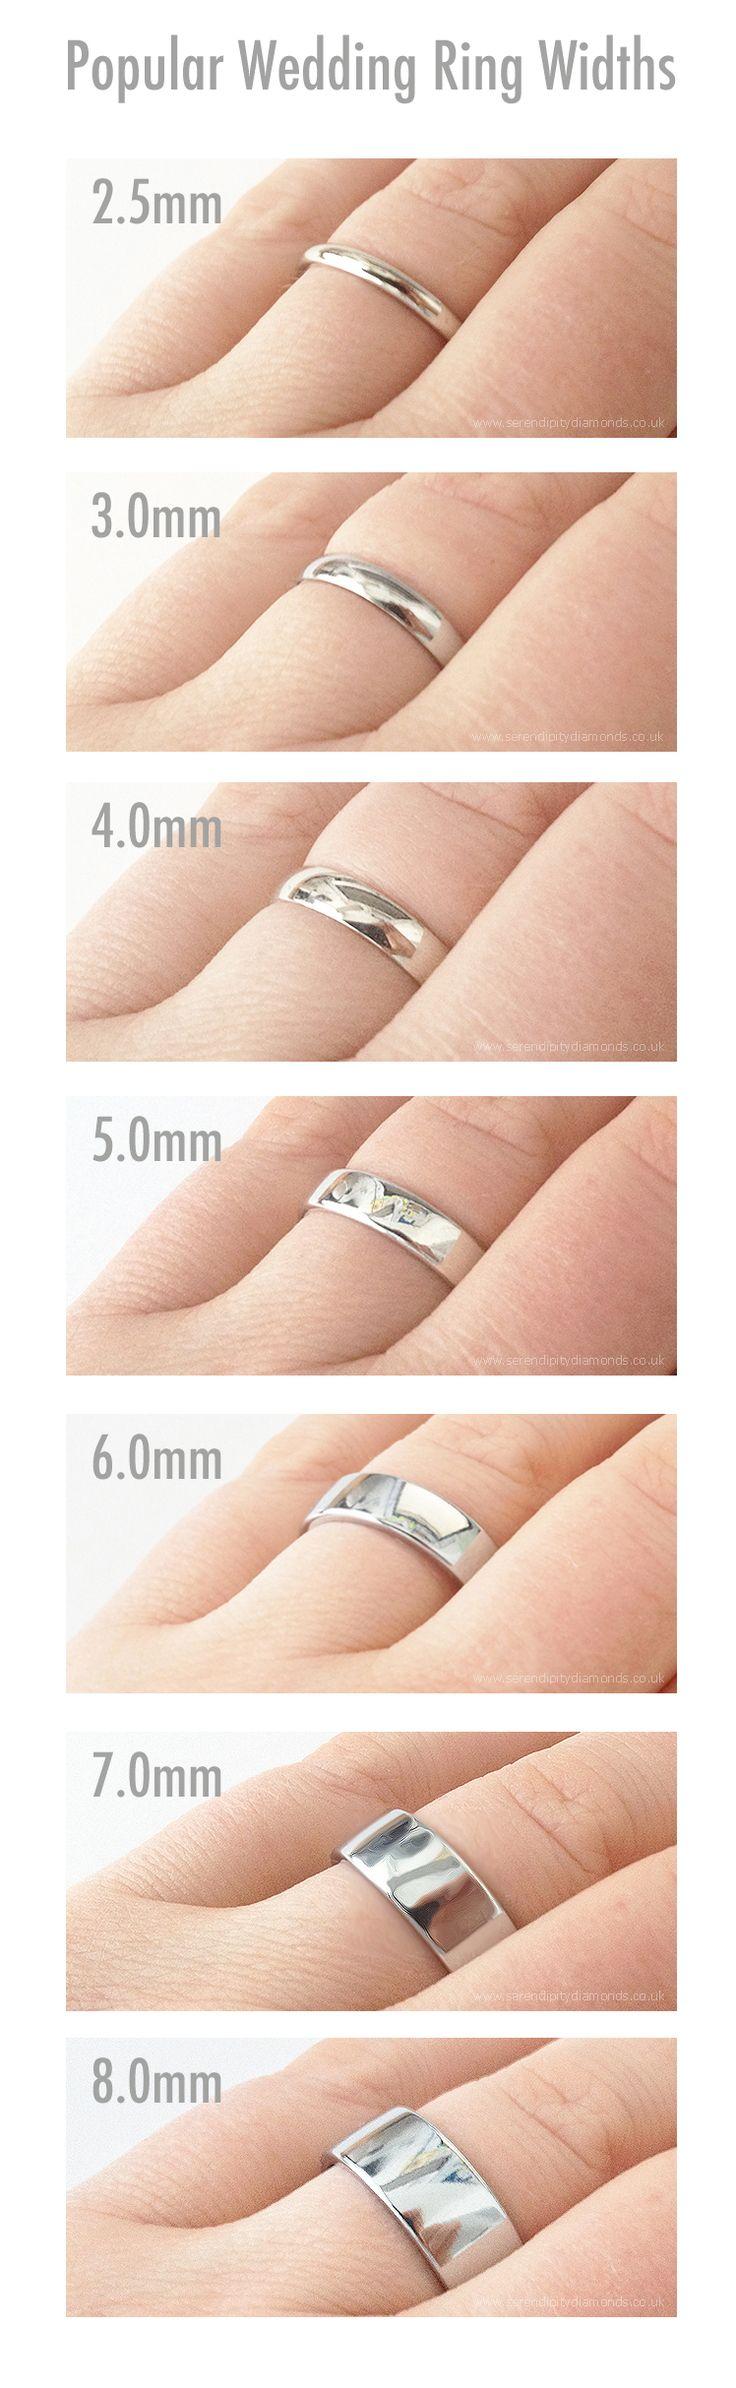 men wedding rings rings wedding O guia definitivo para escolher suas alian as de casamento Wedding Ring